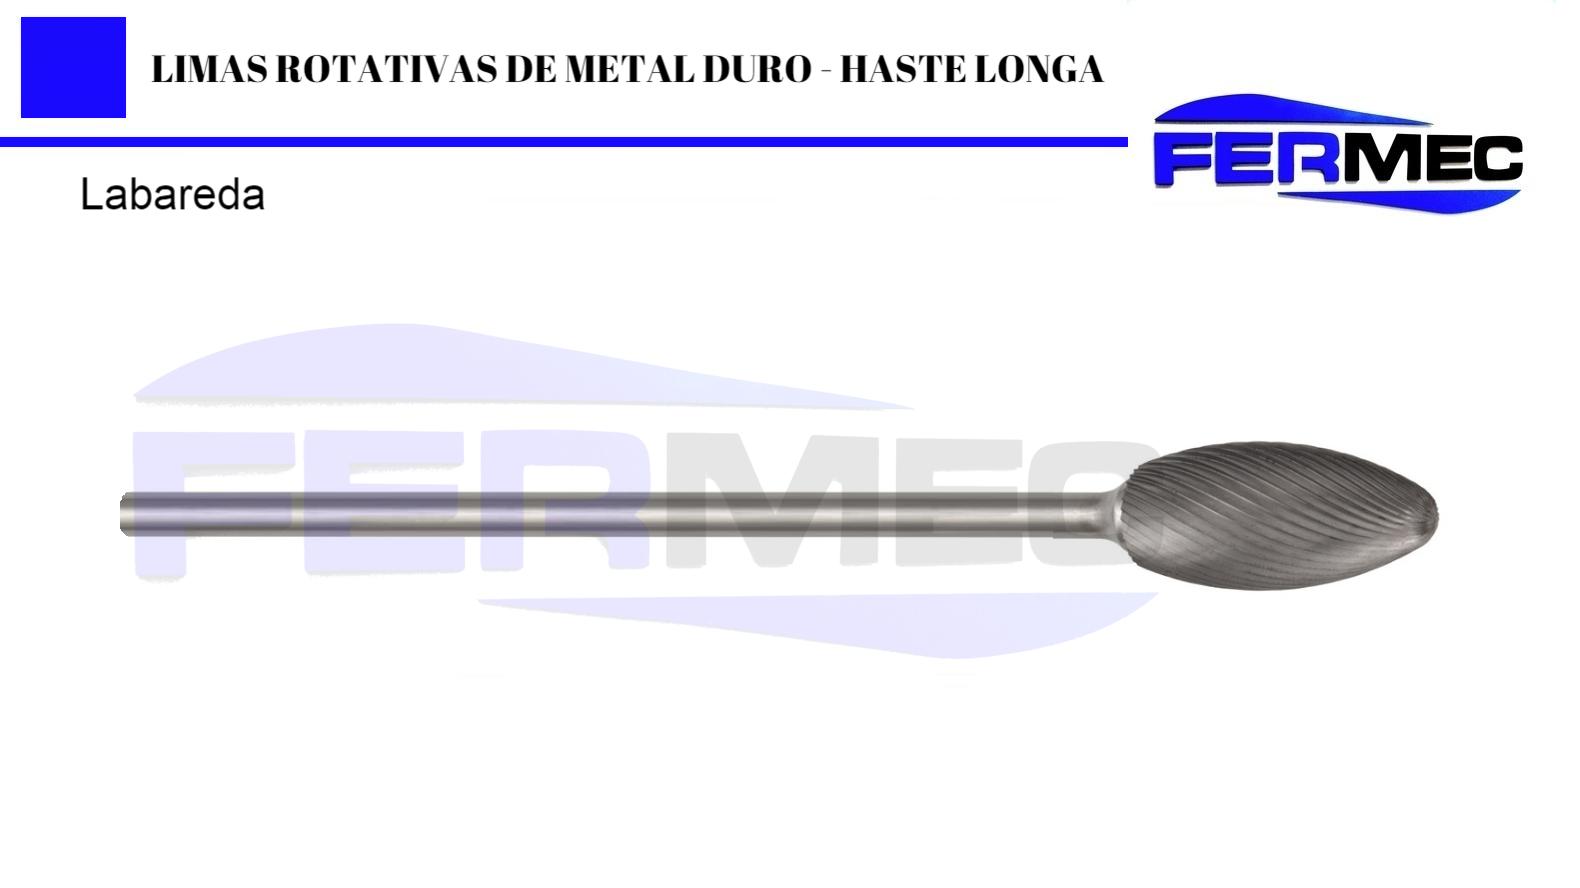 Lima Rotativa Metal Duro Labareda Haste Longa